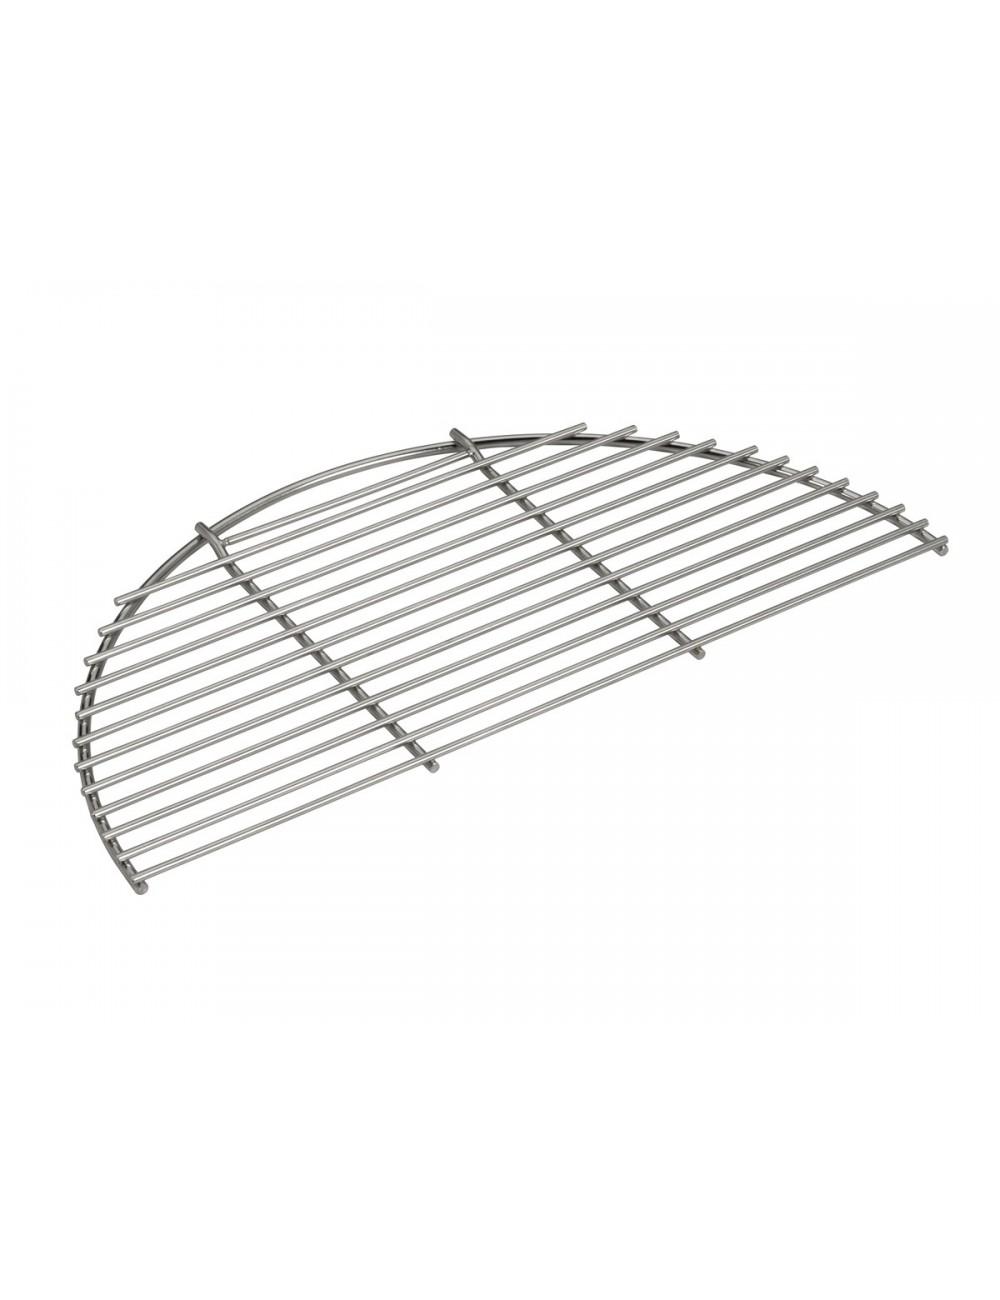 Demi-grille en acier inoxydable